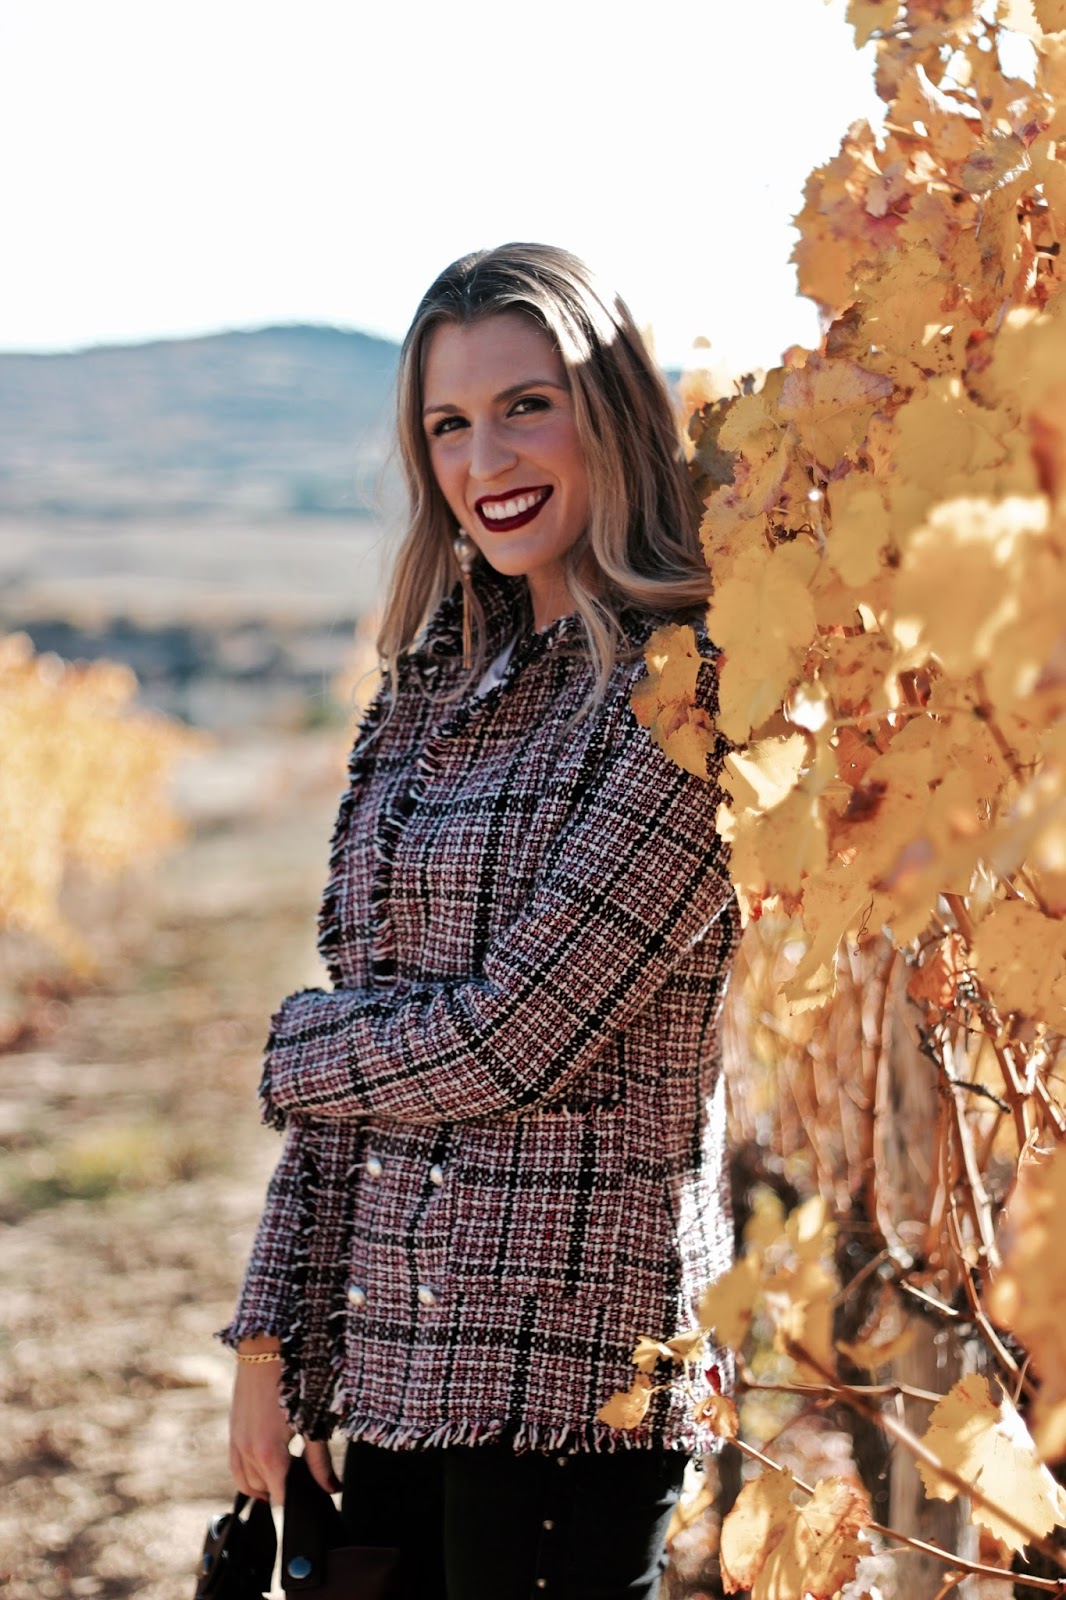 chaqueta tipo Chanel otoño